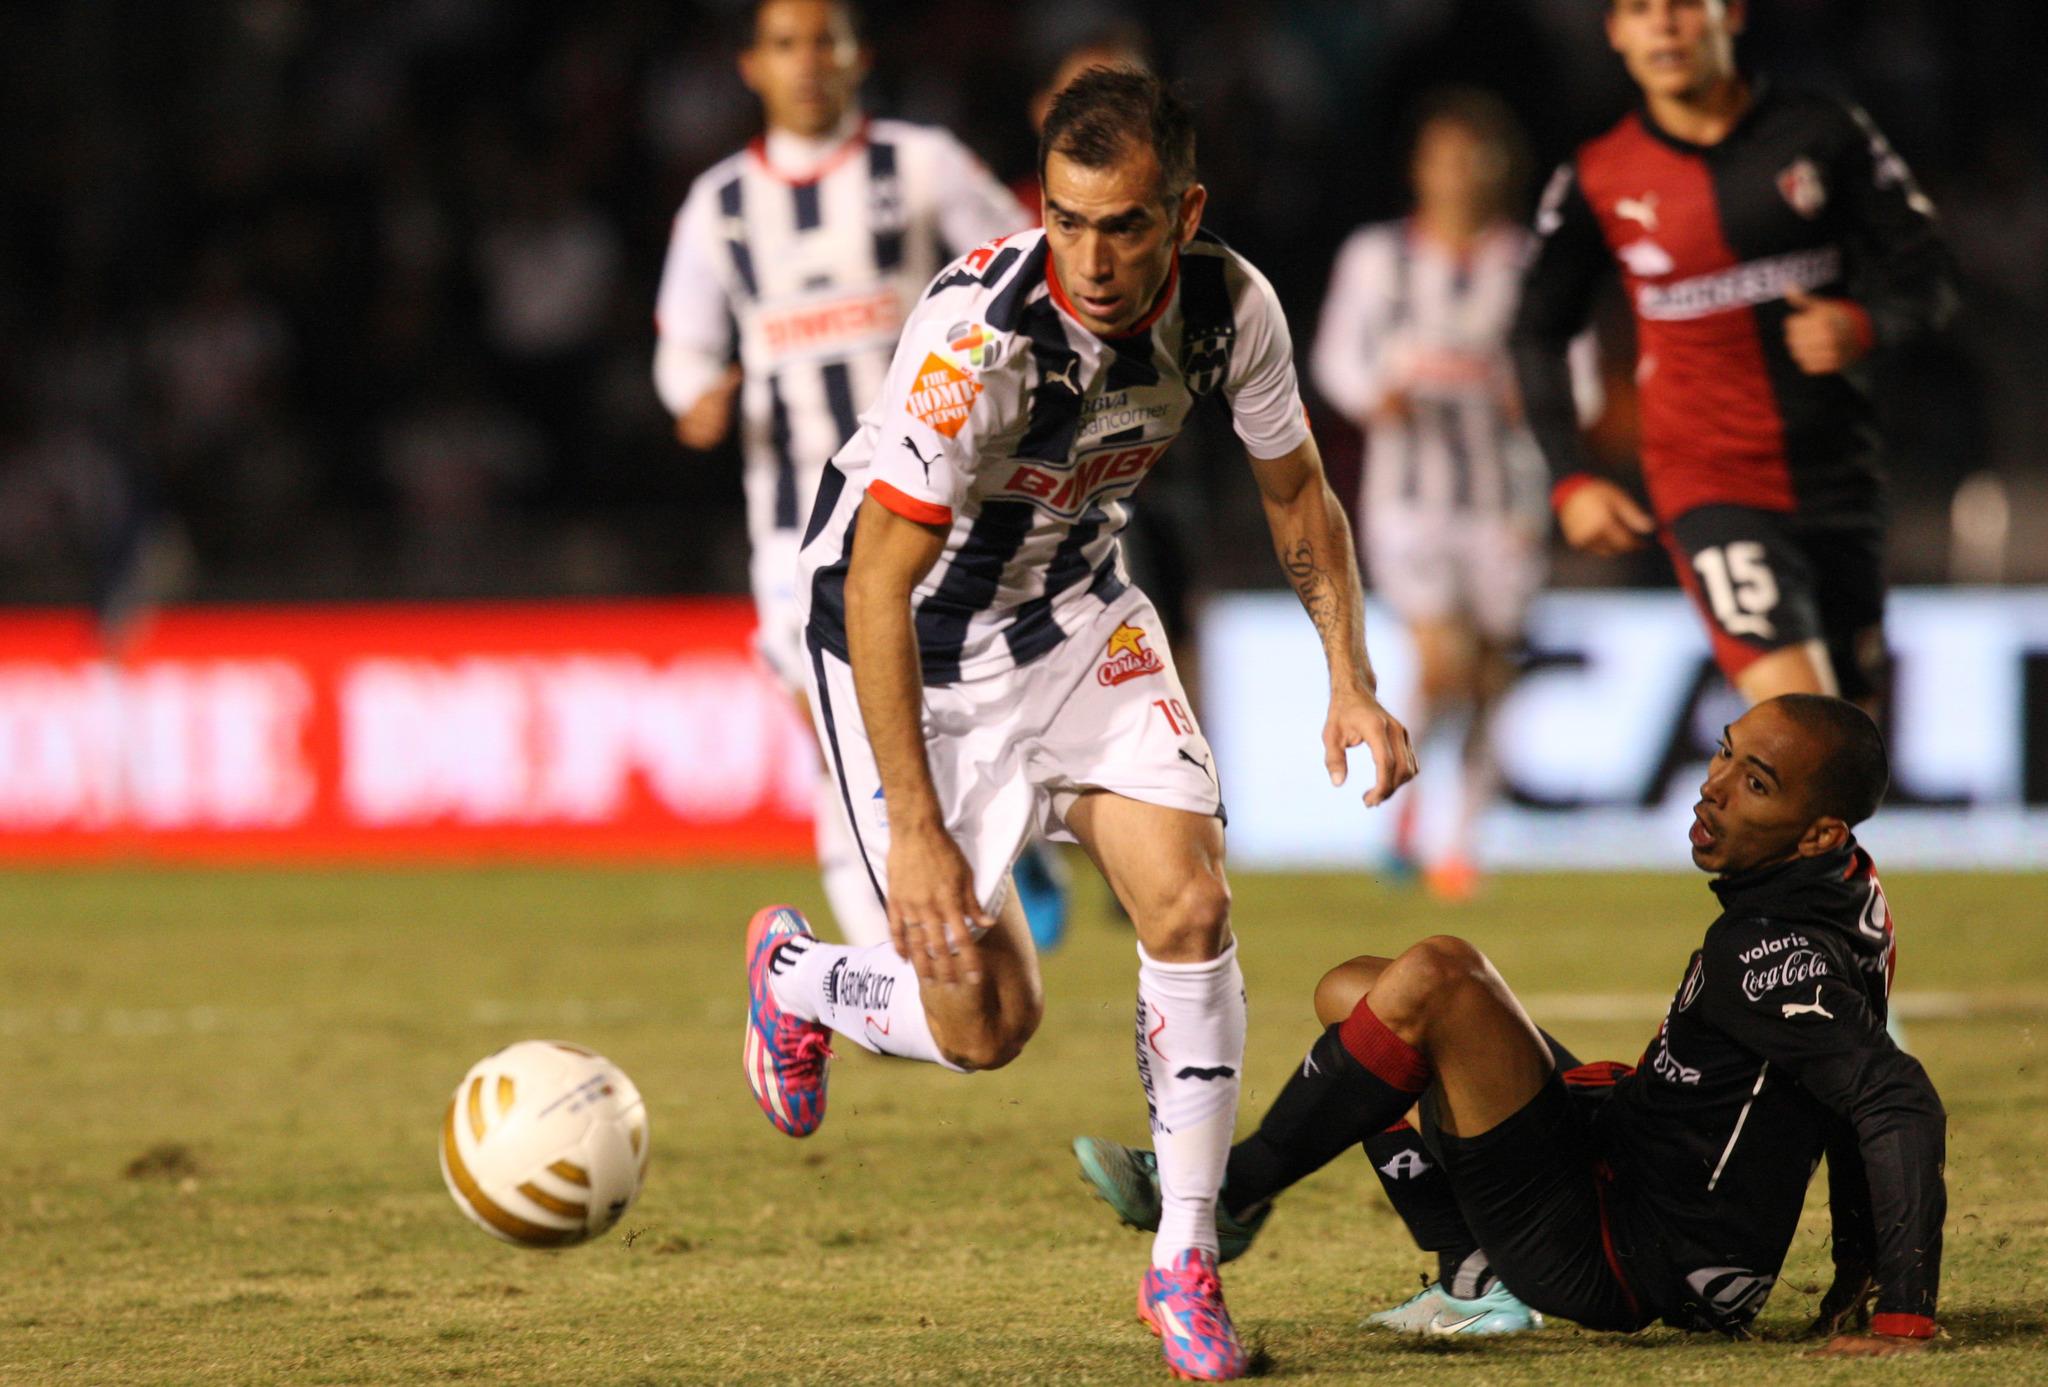 Argentino César \'Chelito\' Delgado anuncia su retiro del futbol